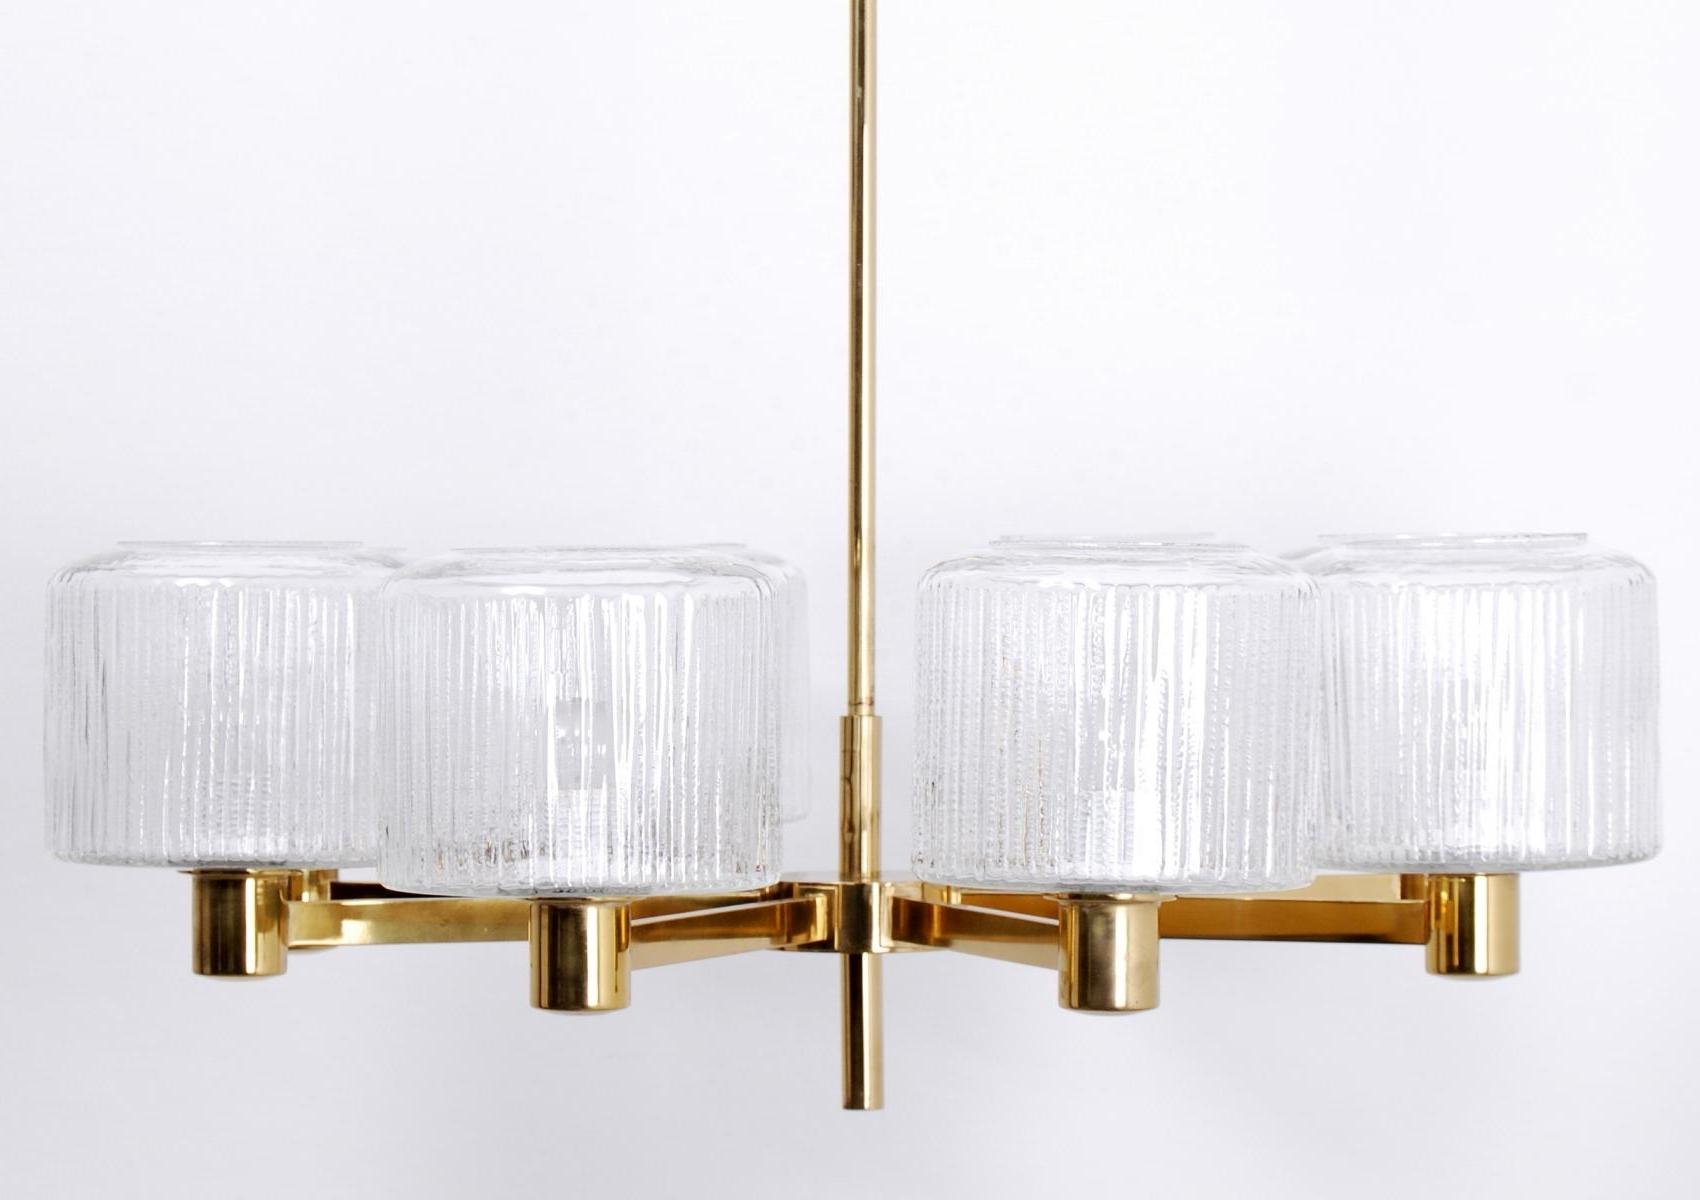 Famous Vintage Large Scandinavian Chandelier In Brass For Sale At Pamono Inside Scandinavian Chandeliers (View 6 of 20)